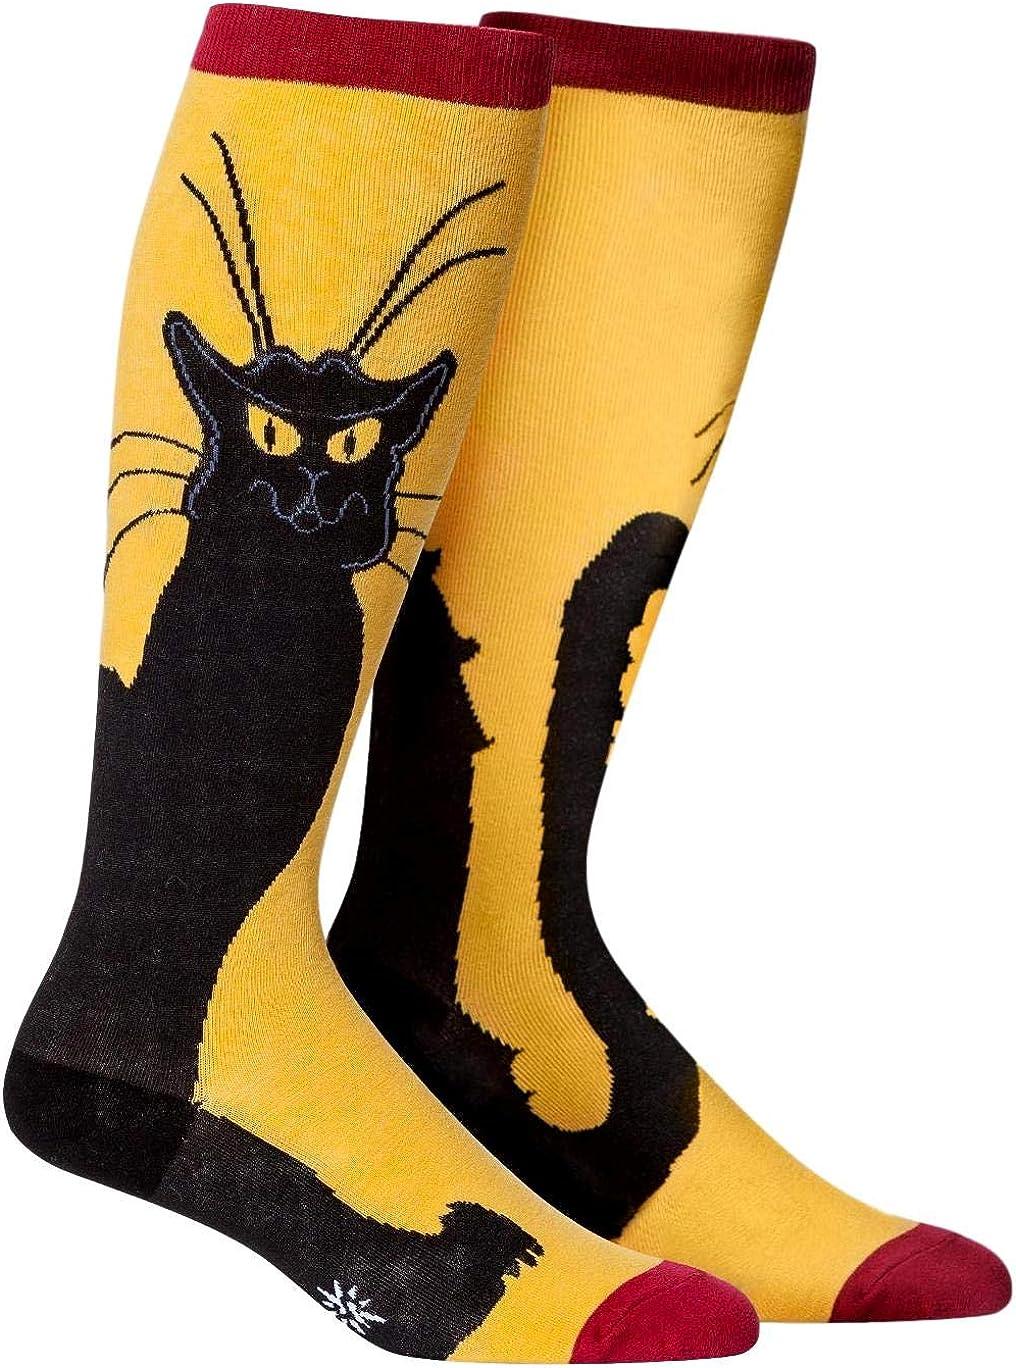 Sock It To Me, Stretch Wide-Calf Knee High Socks